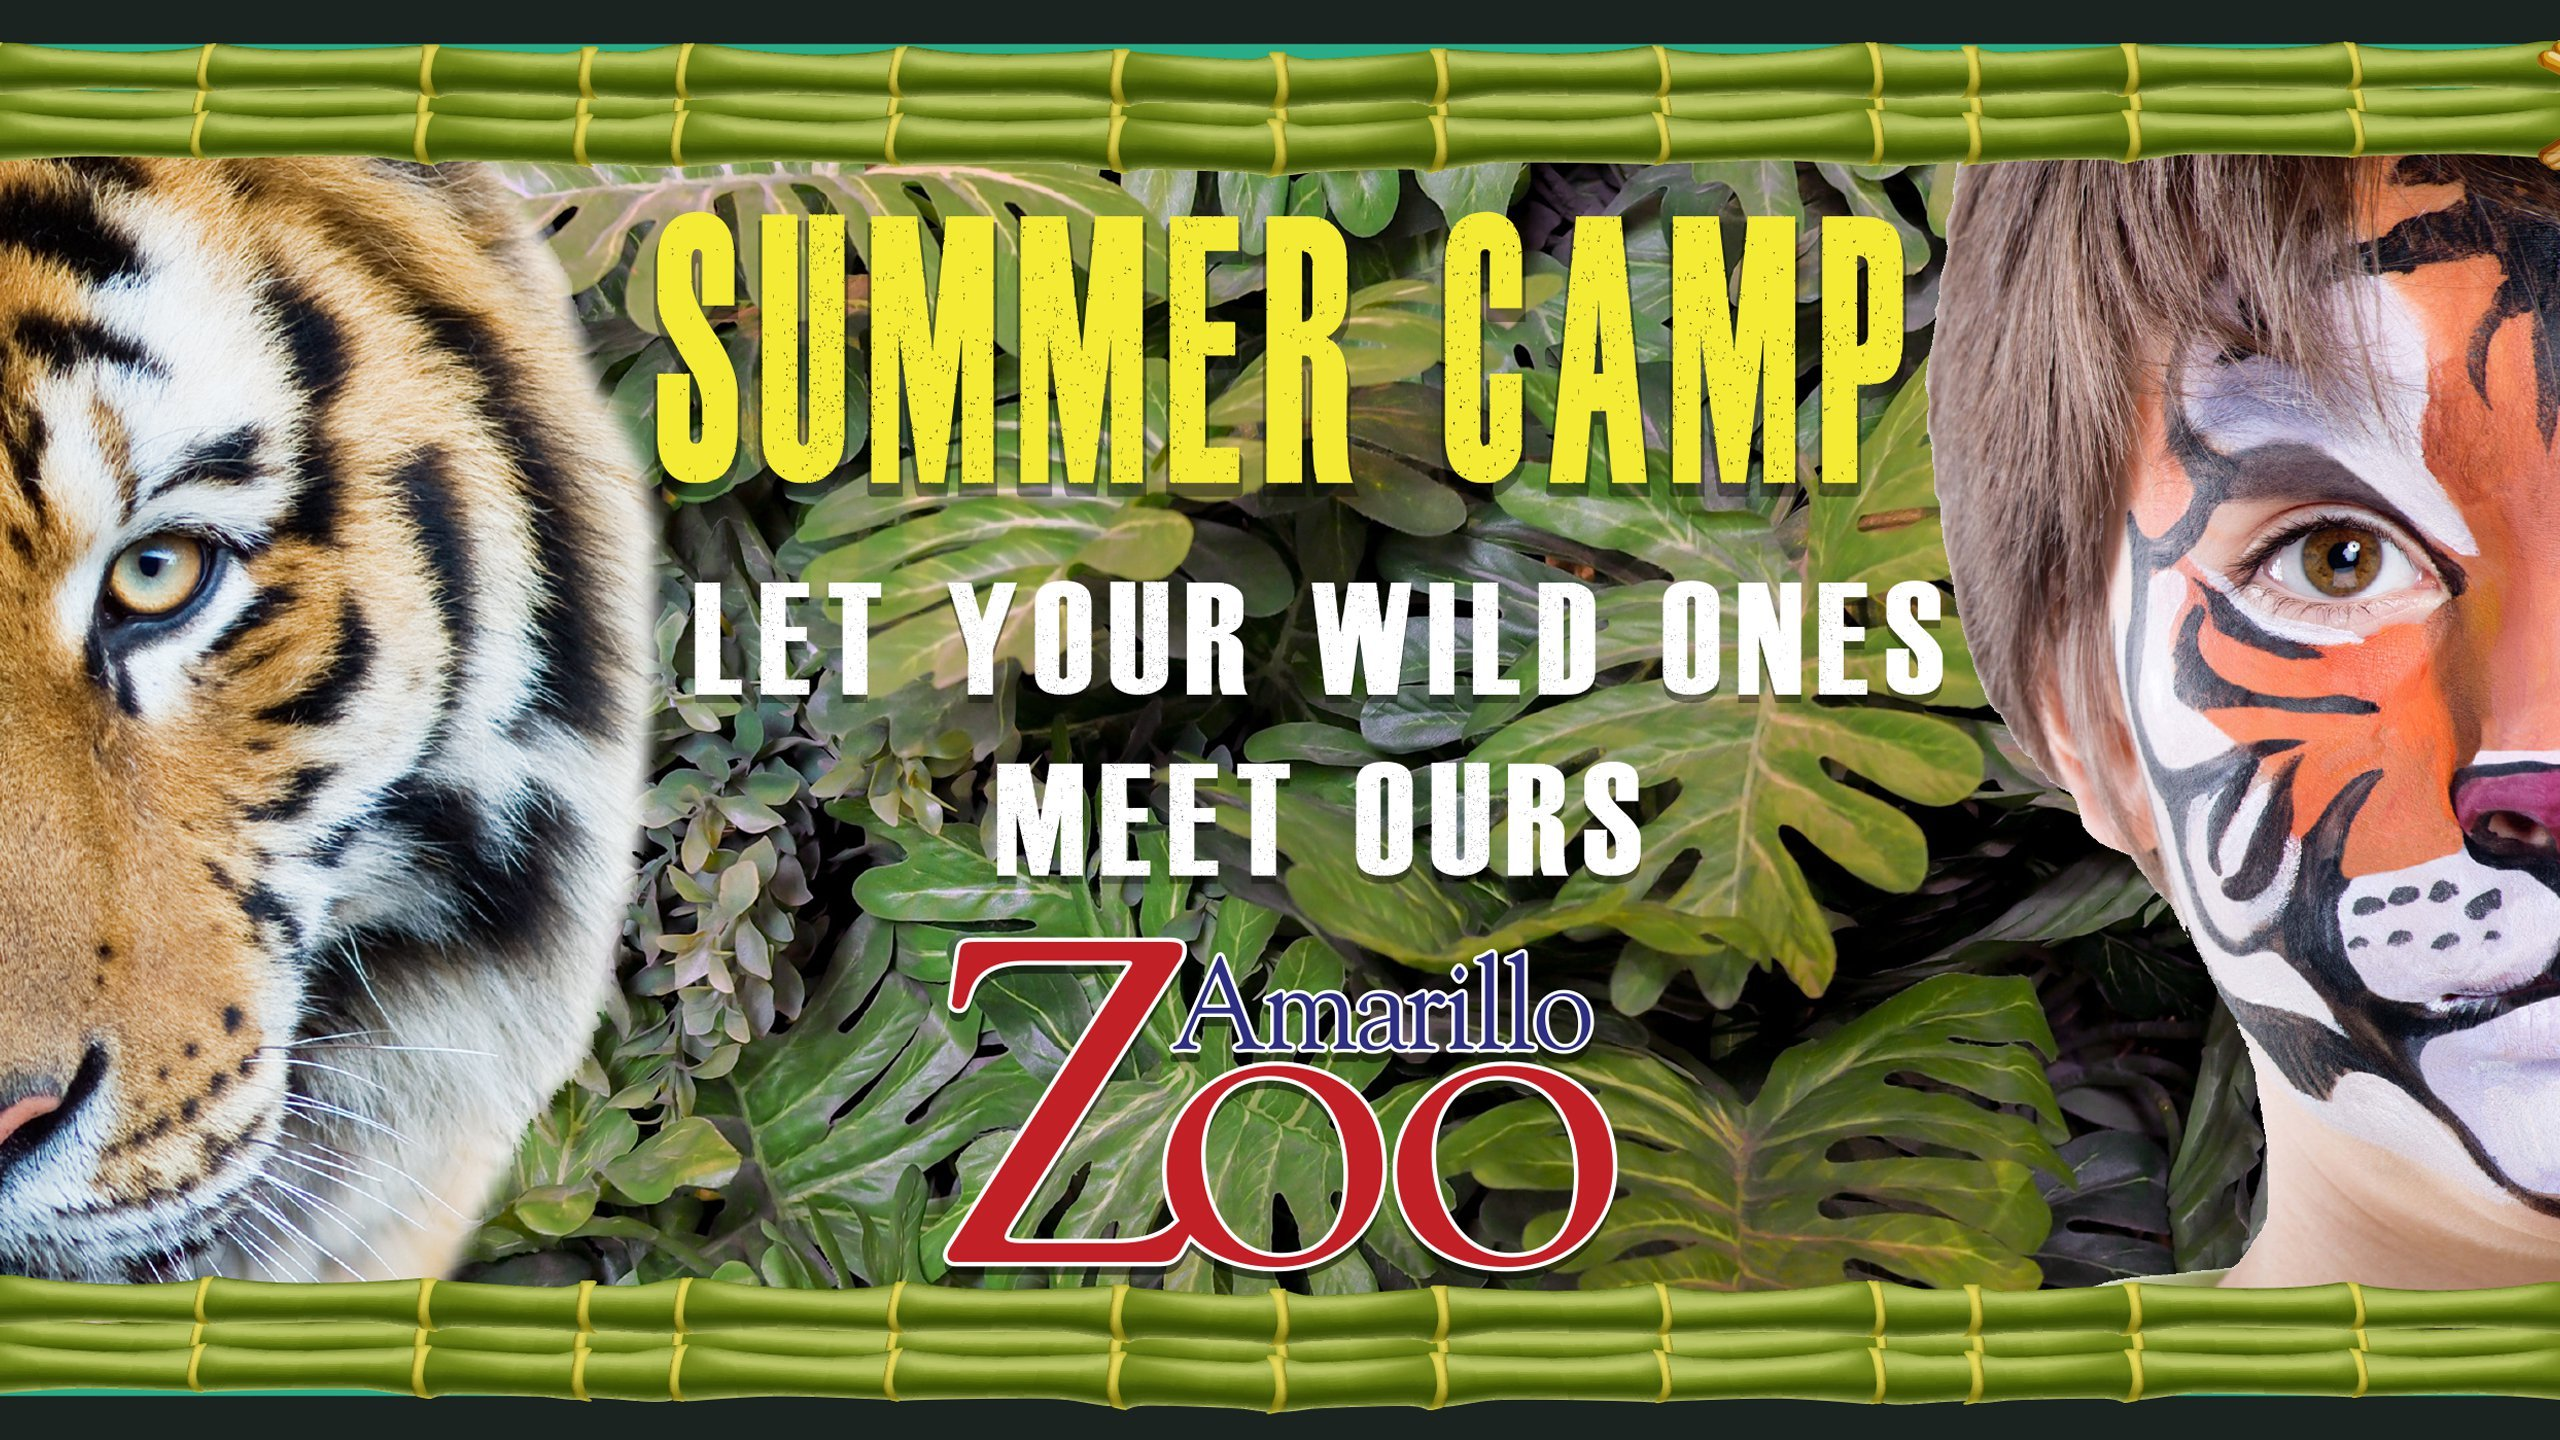 SUMMER CAMP AT ZOO_1557516626046.JPG.jpg